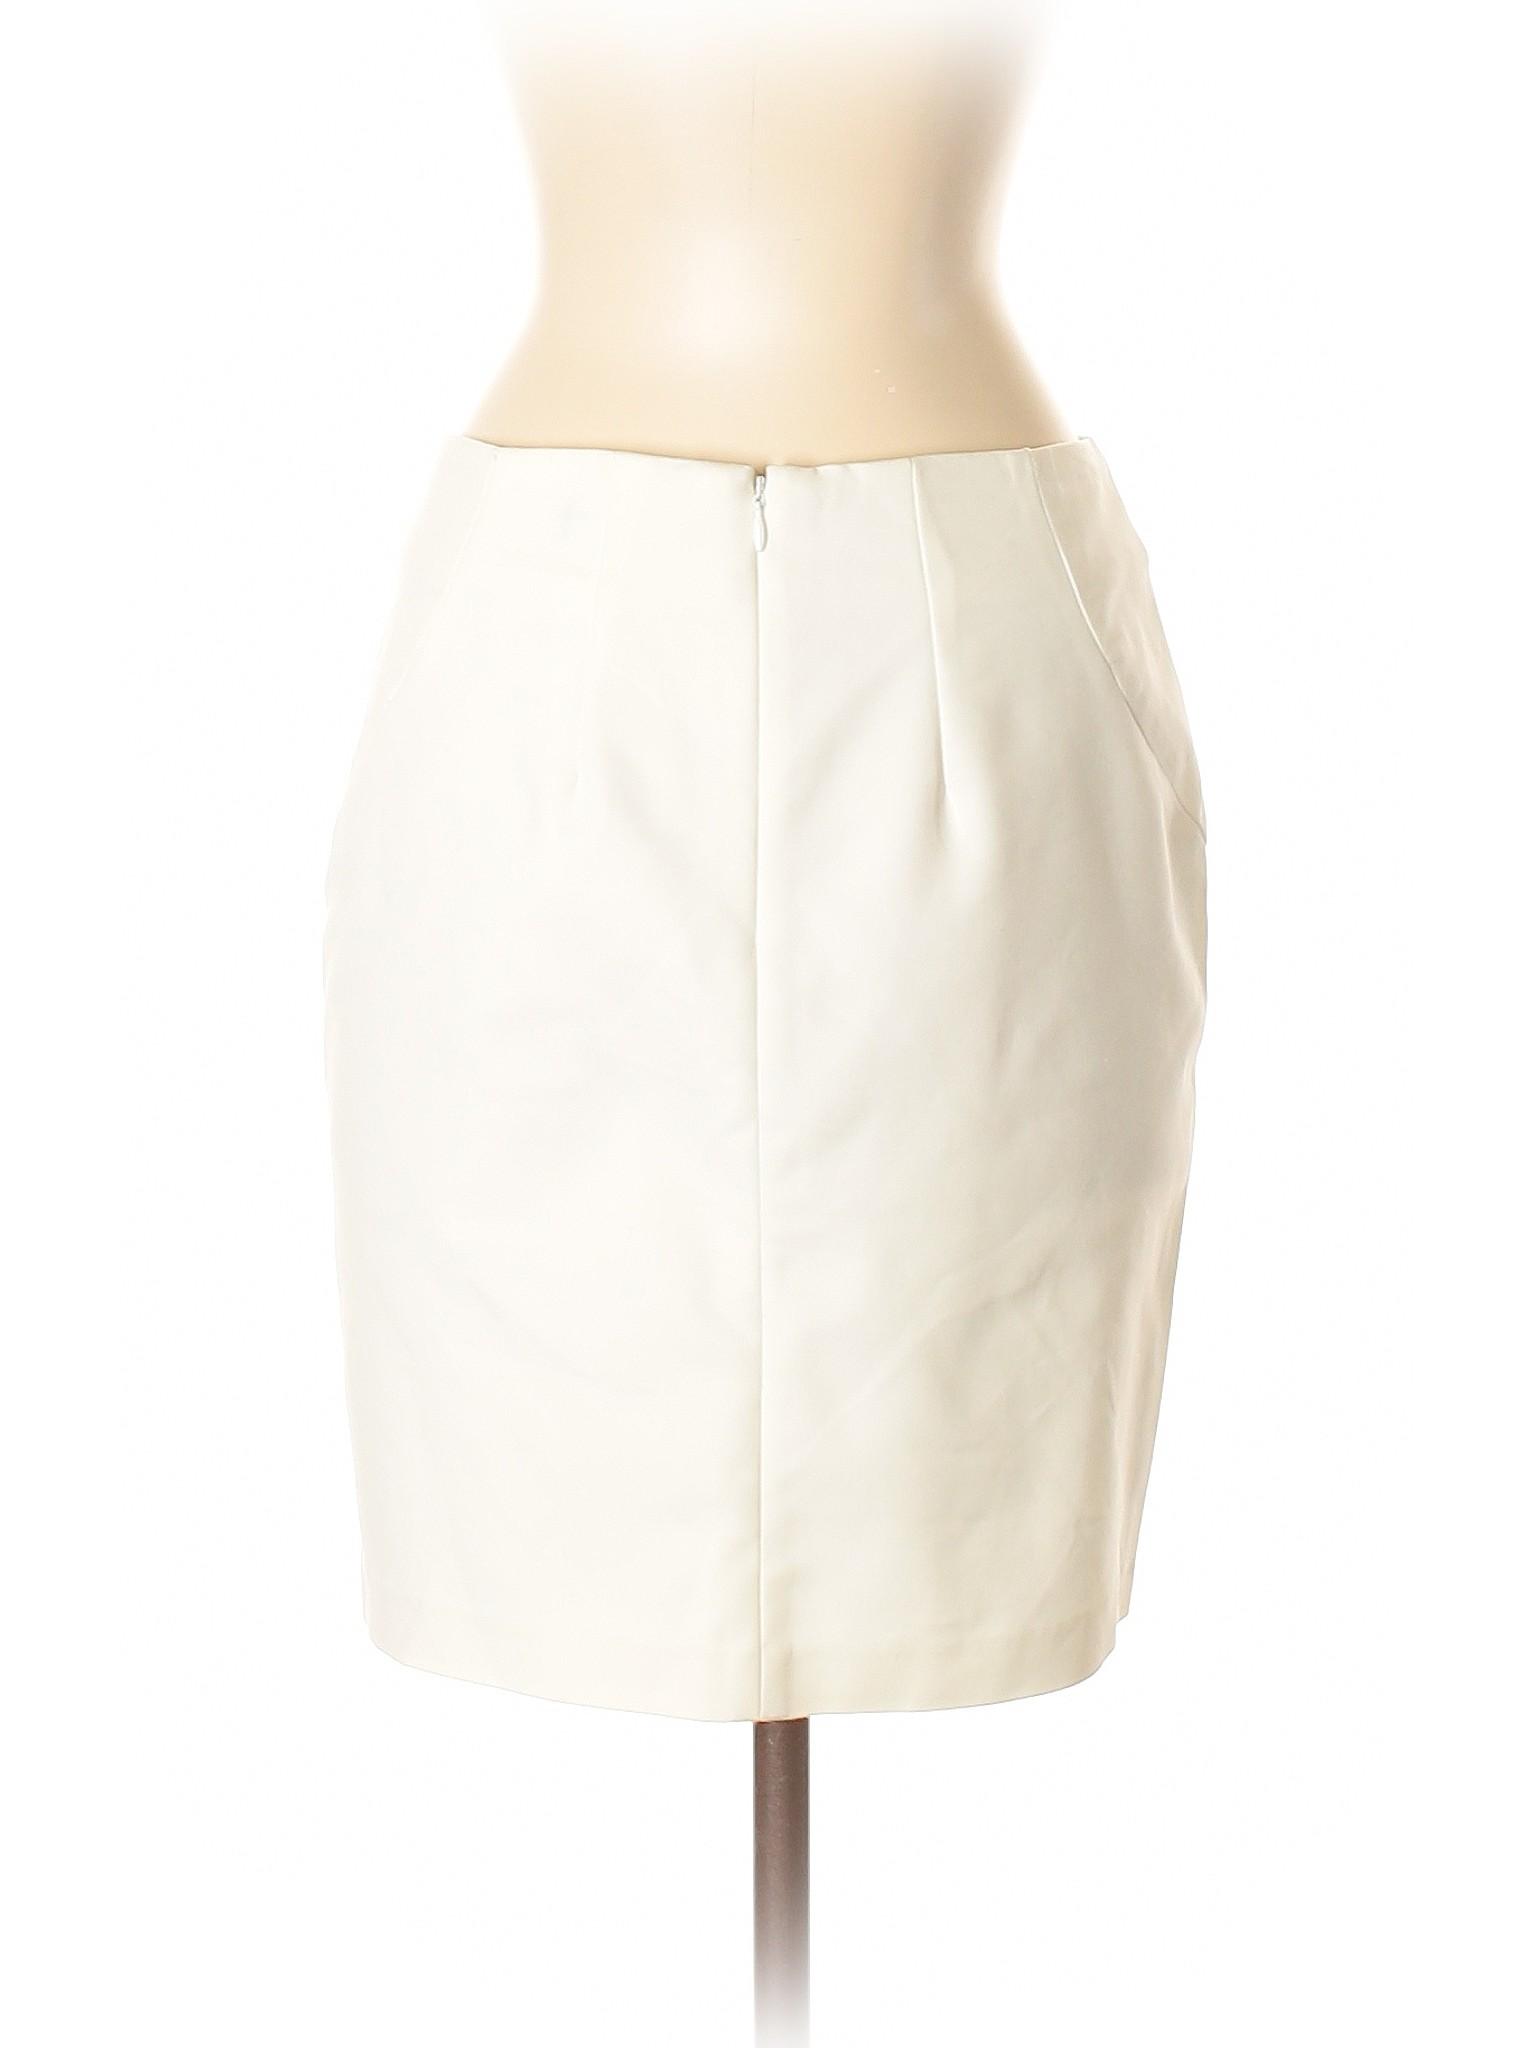 Casual Boutique Skirt Boutique Bebe Bebe FpfF1